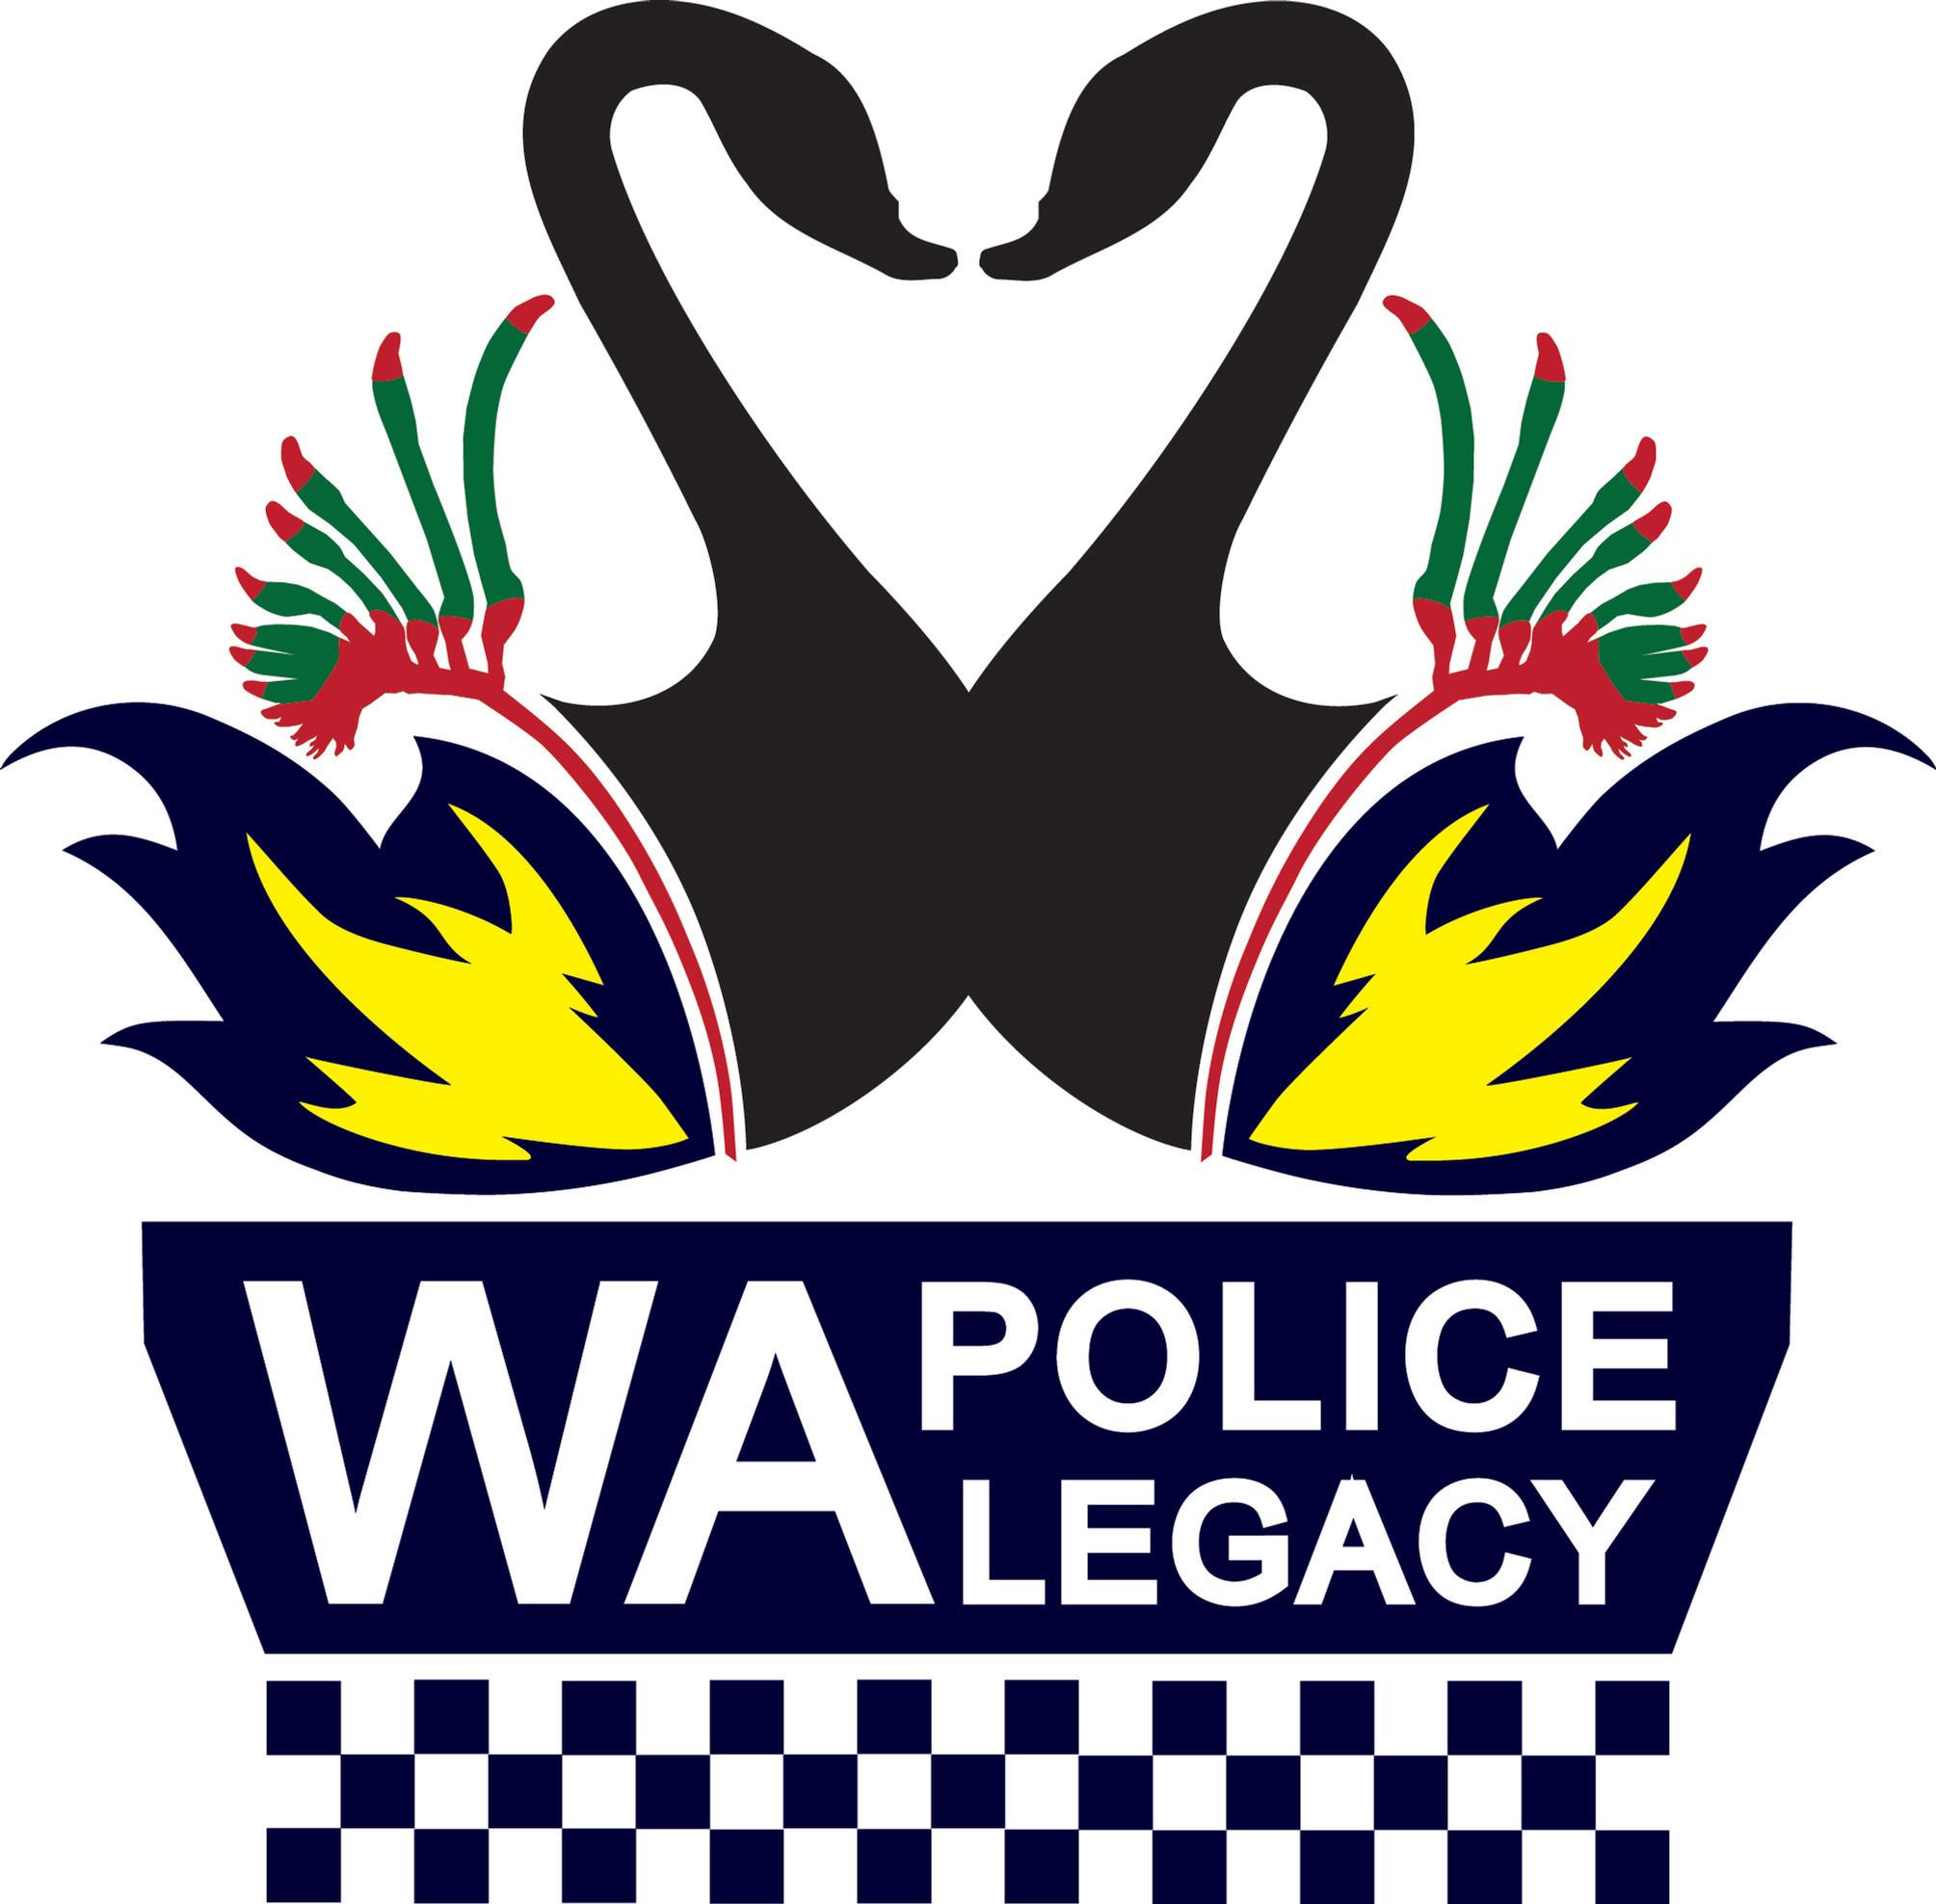 Wa Police Legacy Wa Police Legacy Inc South Perth